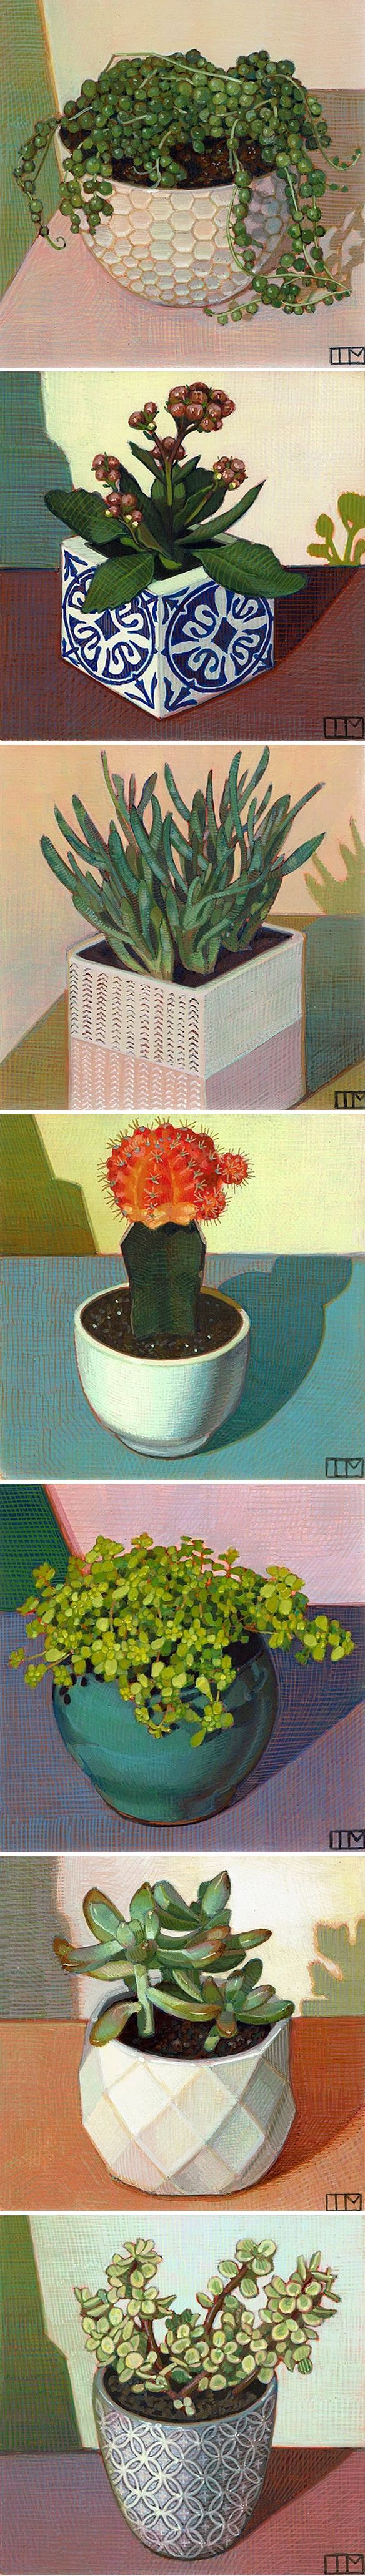 egg tempera paintings by teagan mclarnan #plants #succulents #cactus #art